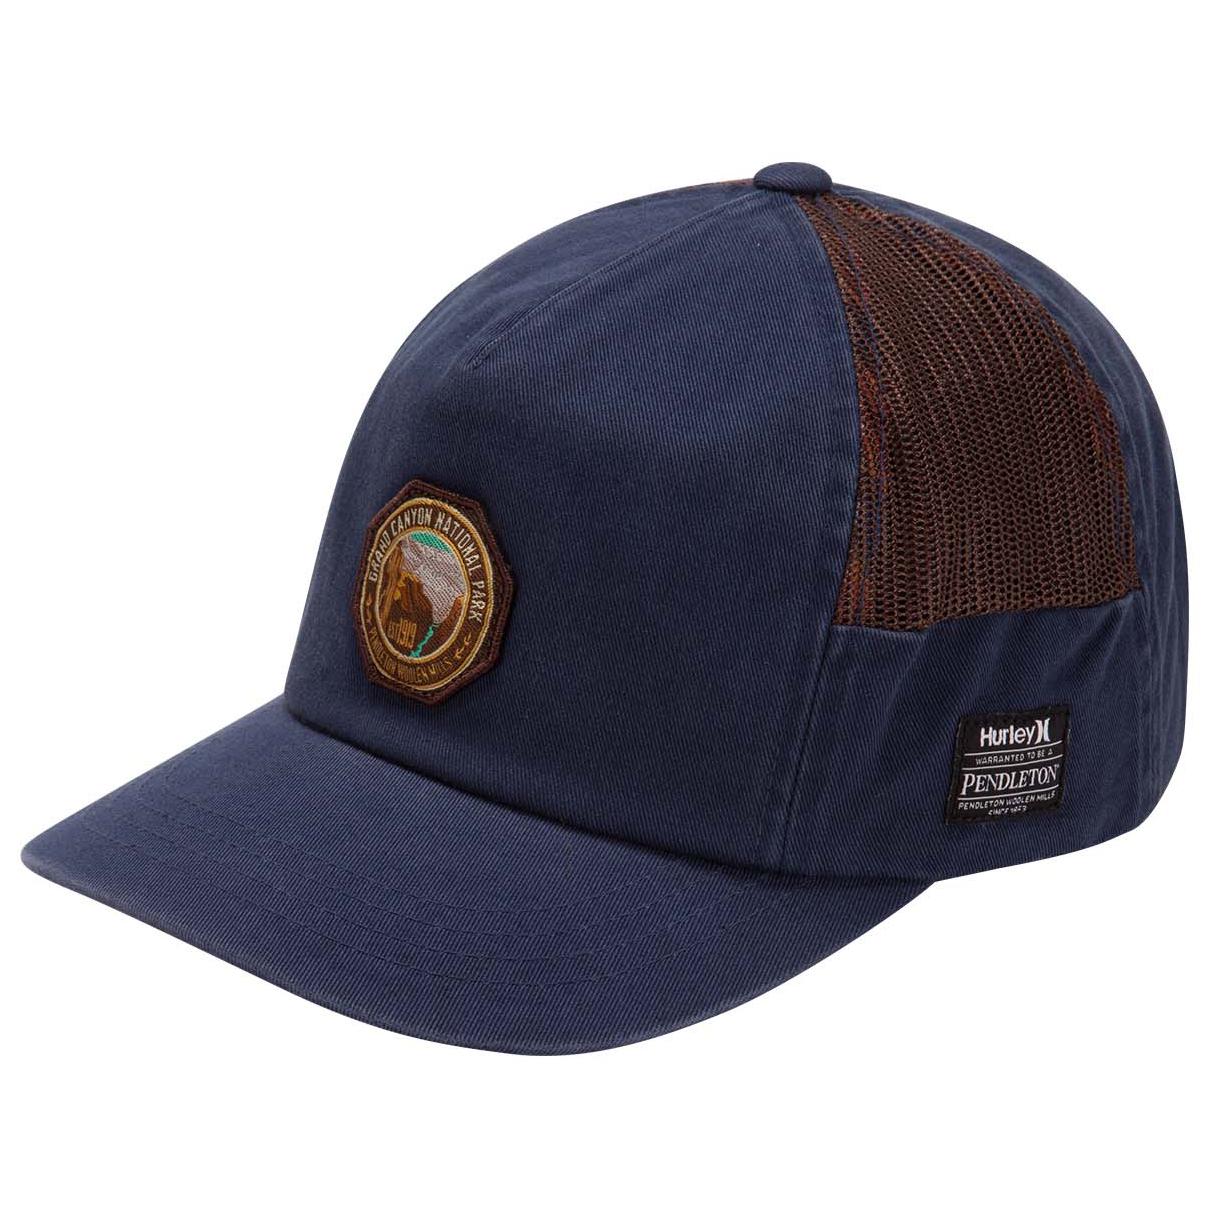 revendeur ffeb0 7ef12 Hurley Pendleton Grand Canyon Hat - Casquette   Achat en ...